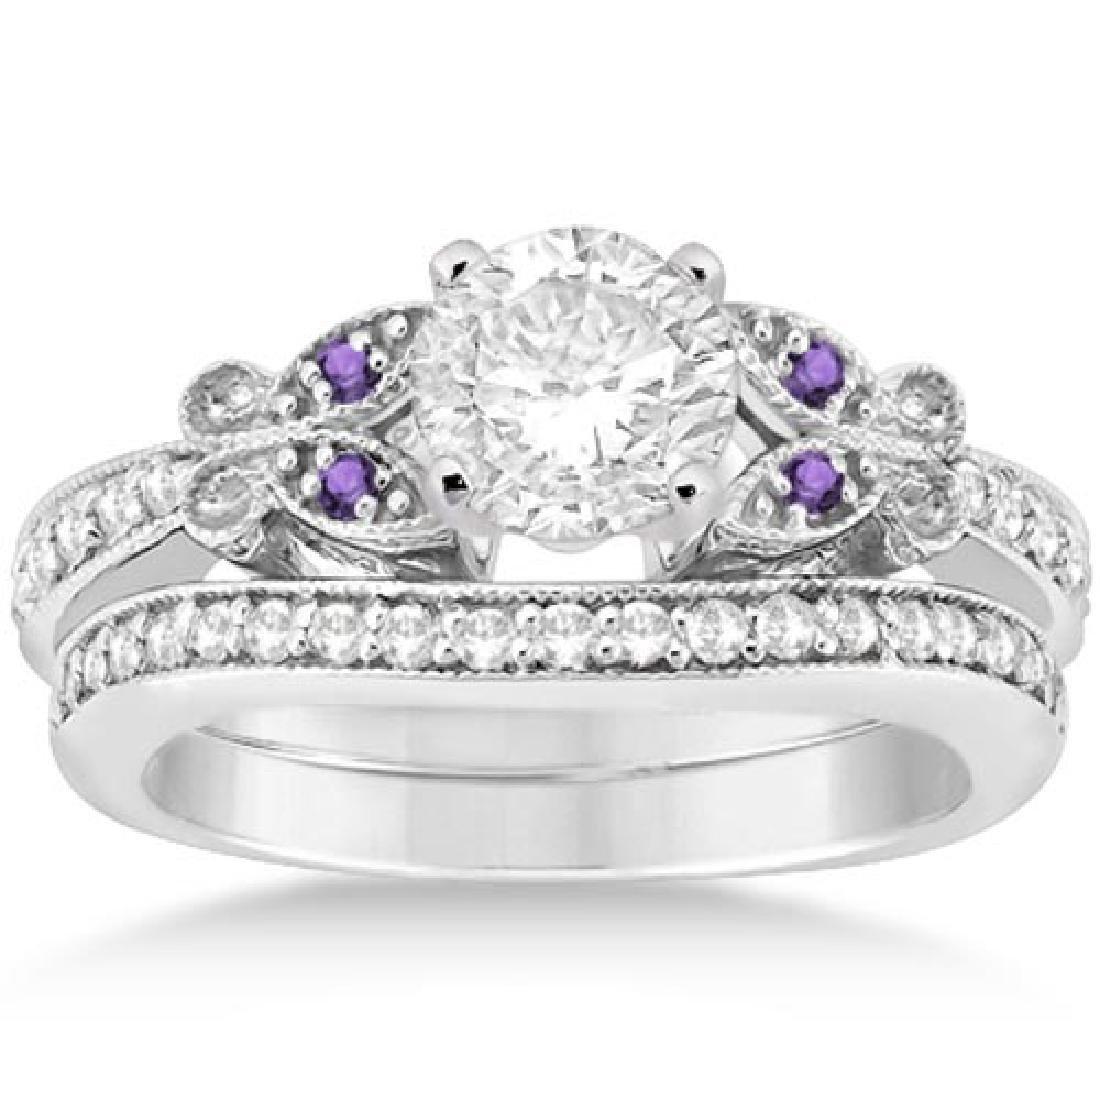 Diamond and Amethyst Bridal ring Setting 14k White Gol